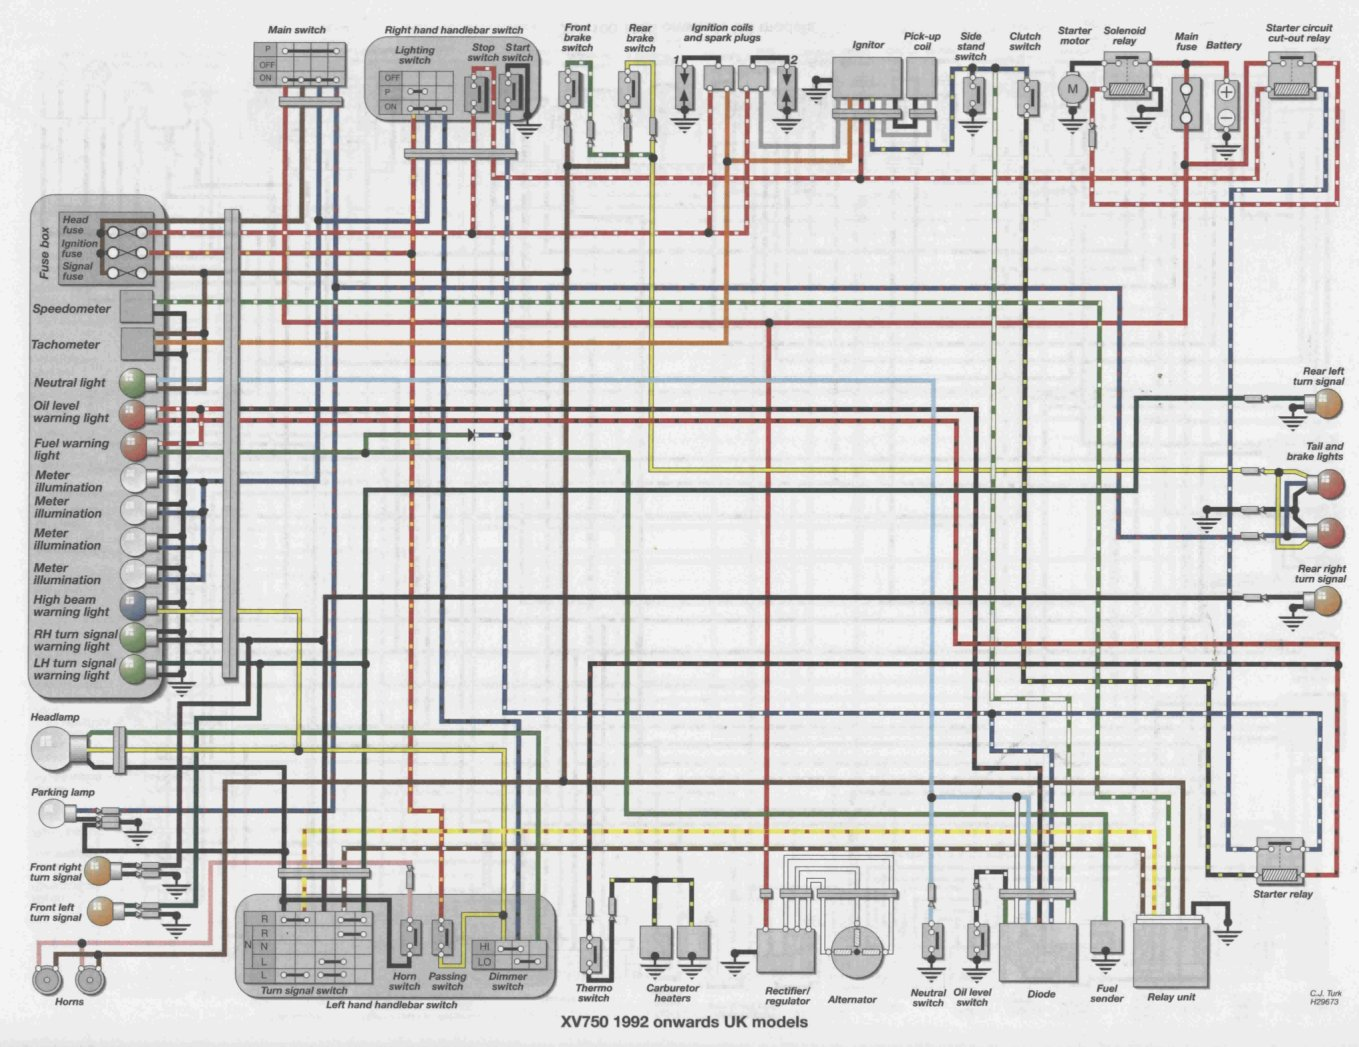 Xjs 1100 Wiring Diagram 1995 Maxima Gle Engine Diagram Vw T5 Ab17 Jeanjaures37 Fr